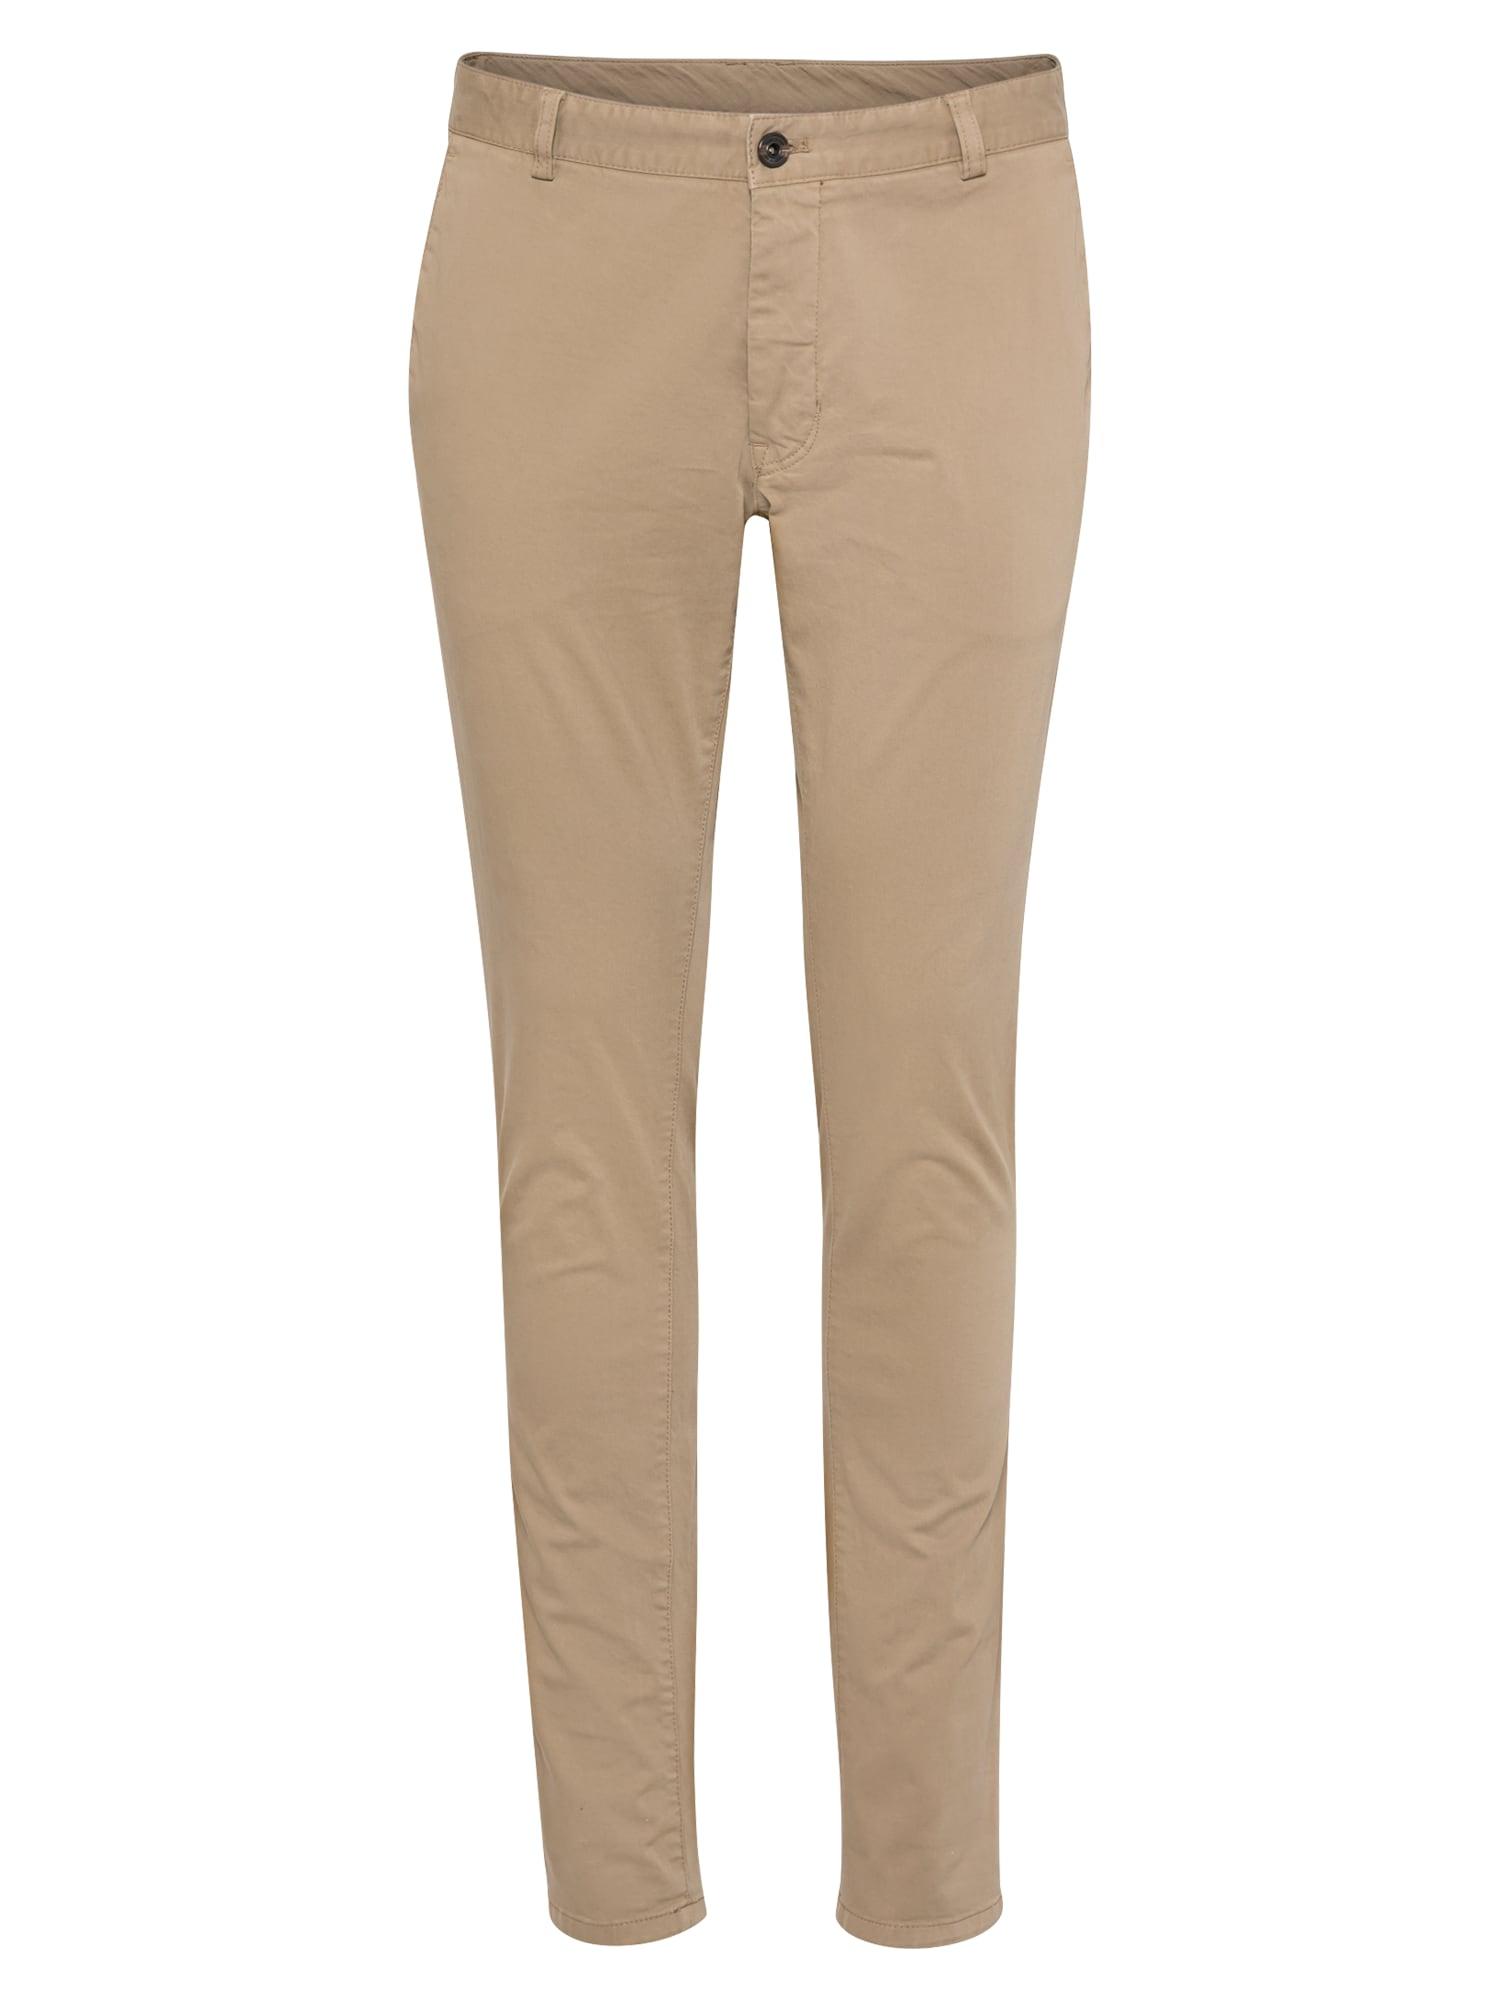 Tiger of Sweden Pantalon 'TRANSIT 4.'  - Beige - Taille: 50 - male